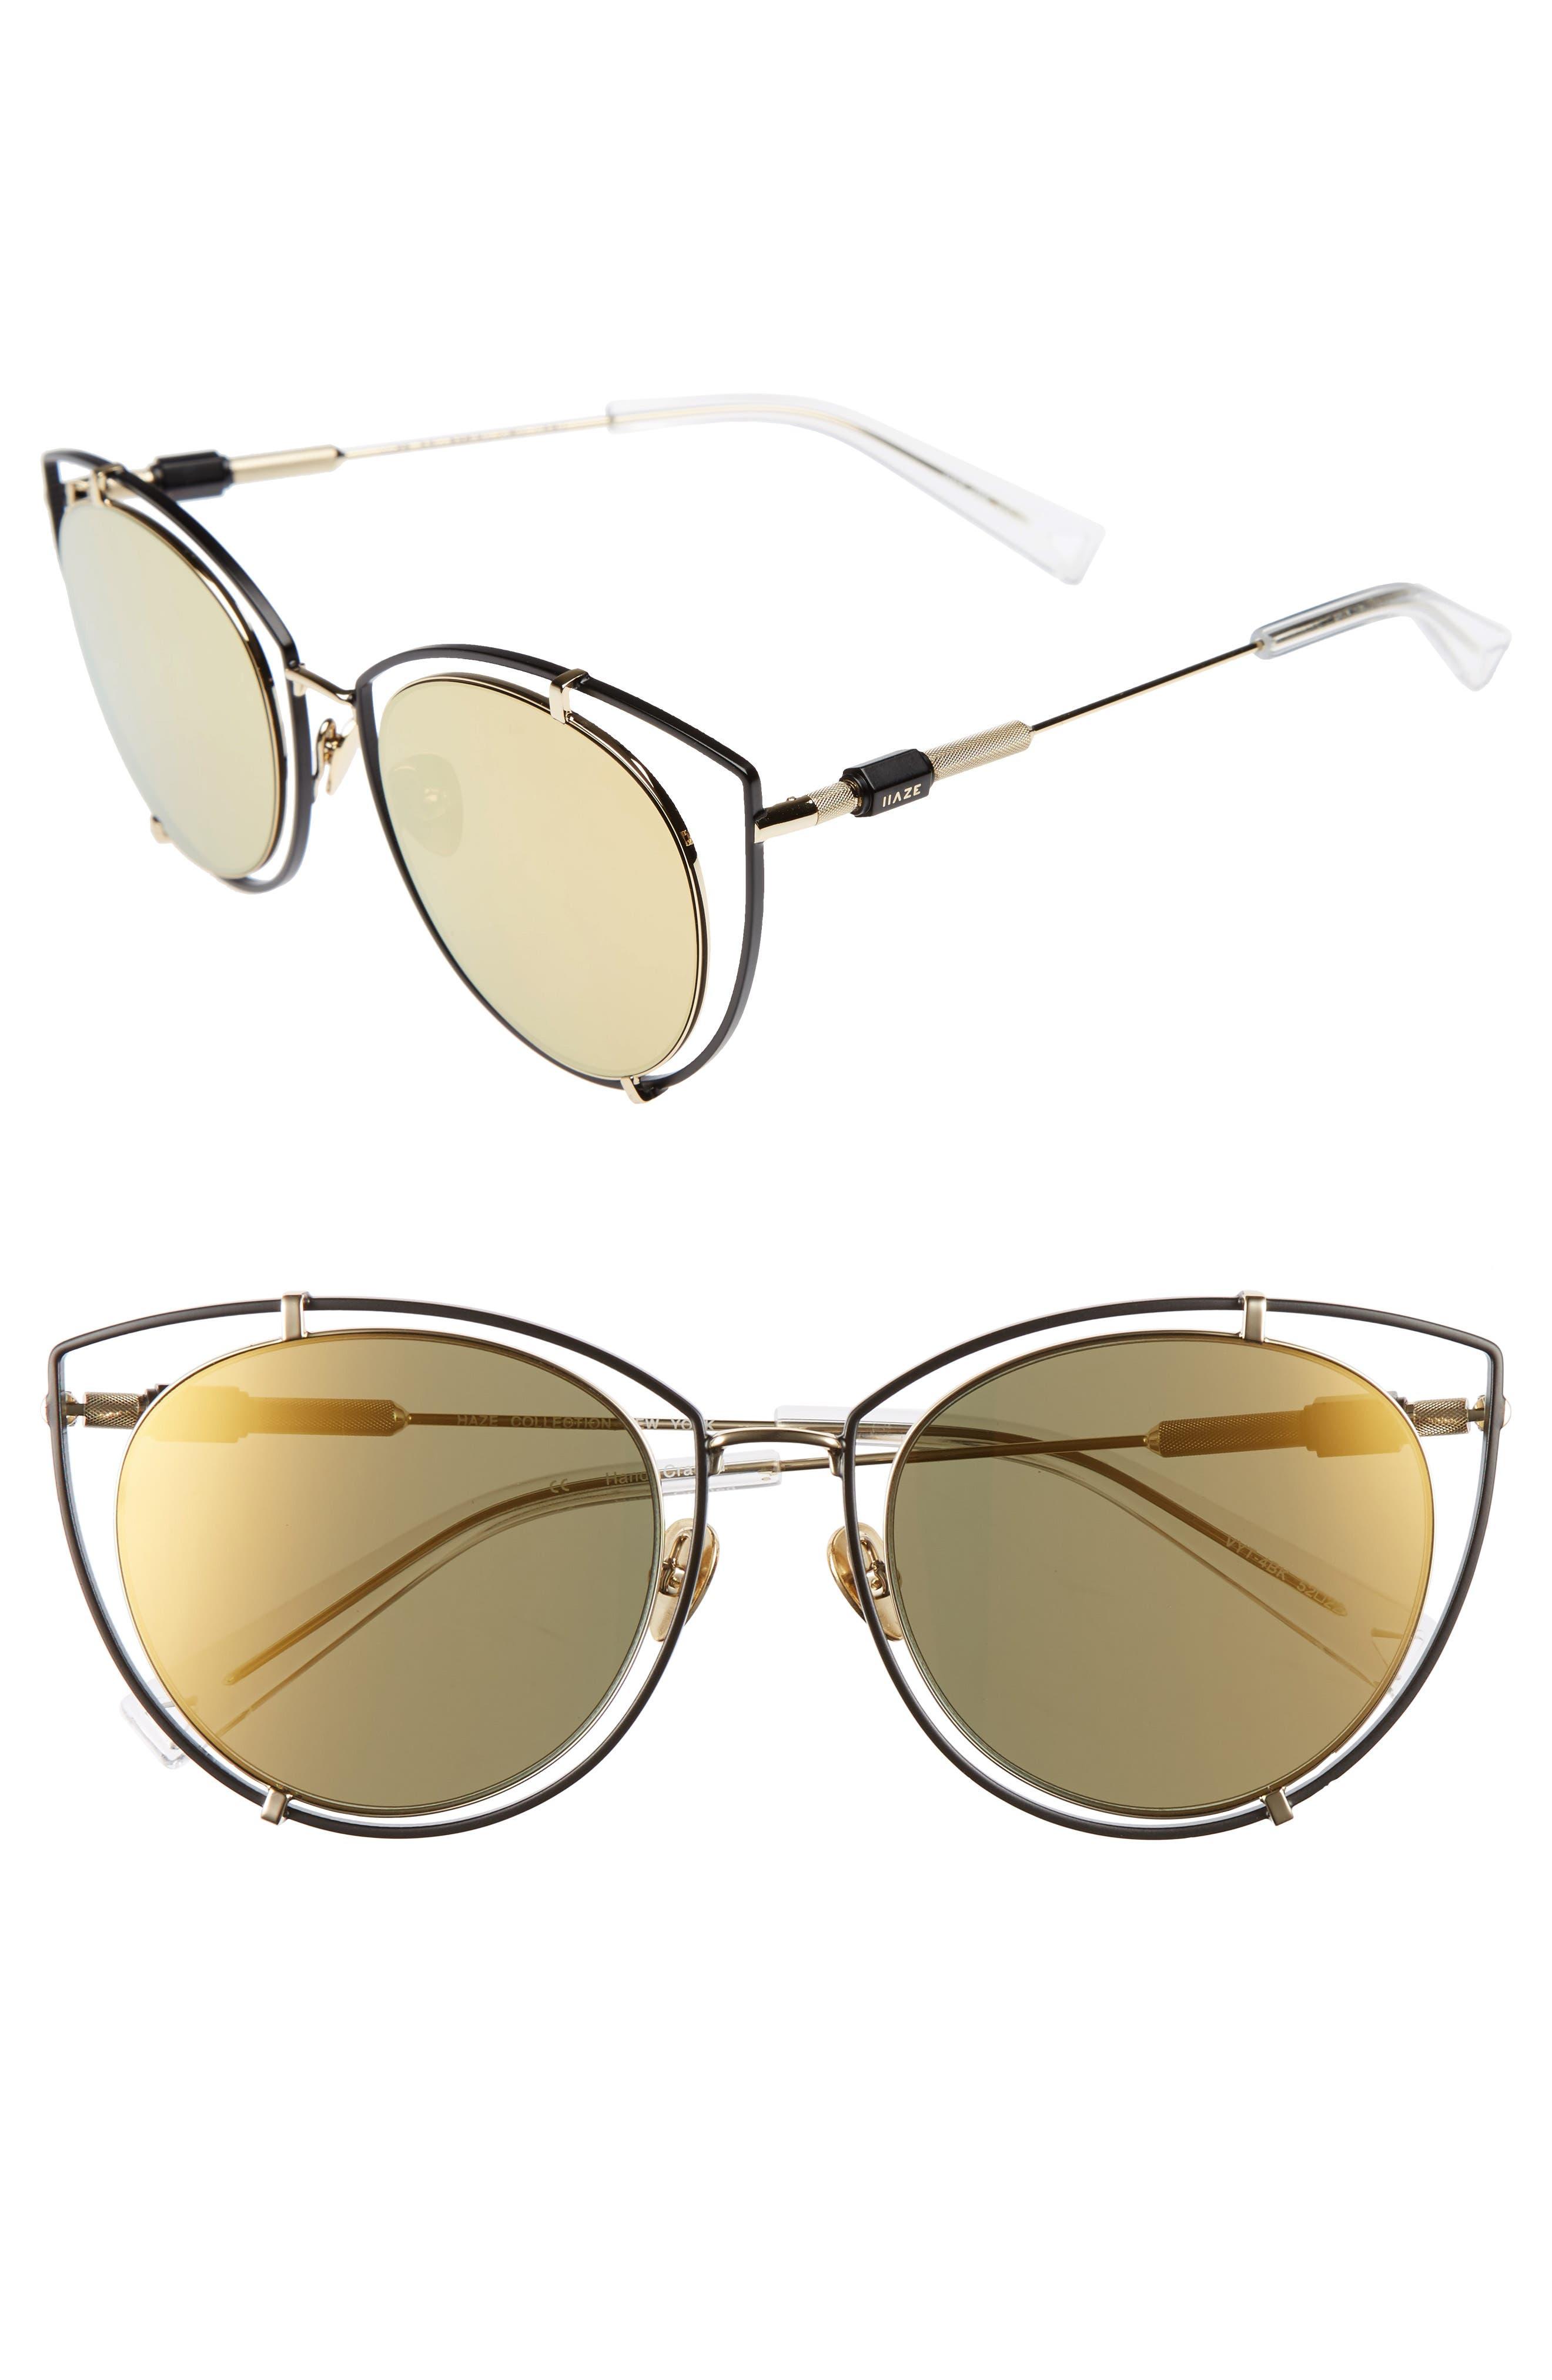 Vyt 53mm Cat Eye Sunglasses,                             Main thumbnail 1, color,                             001